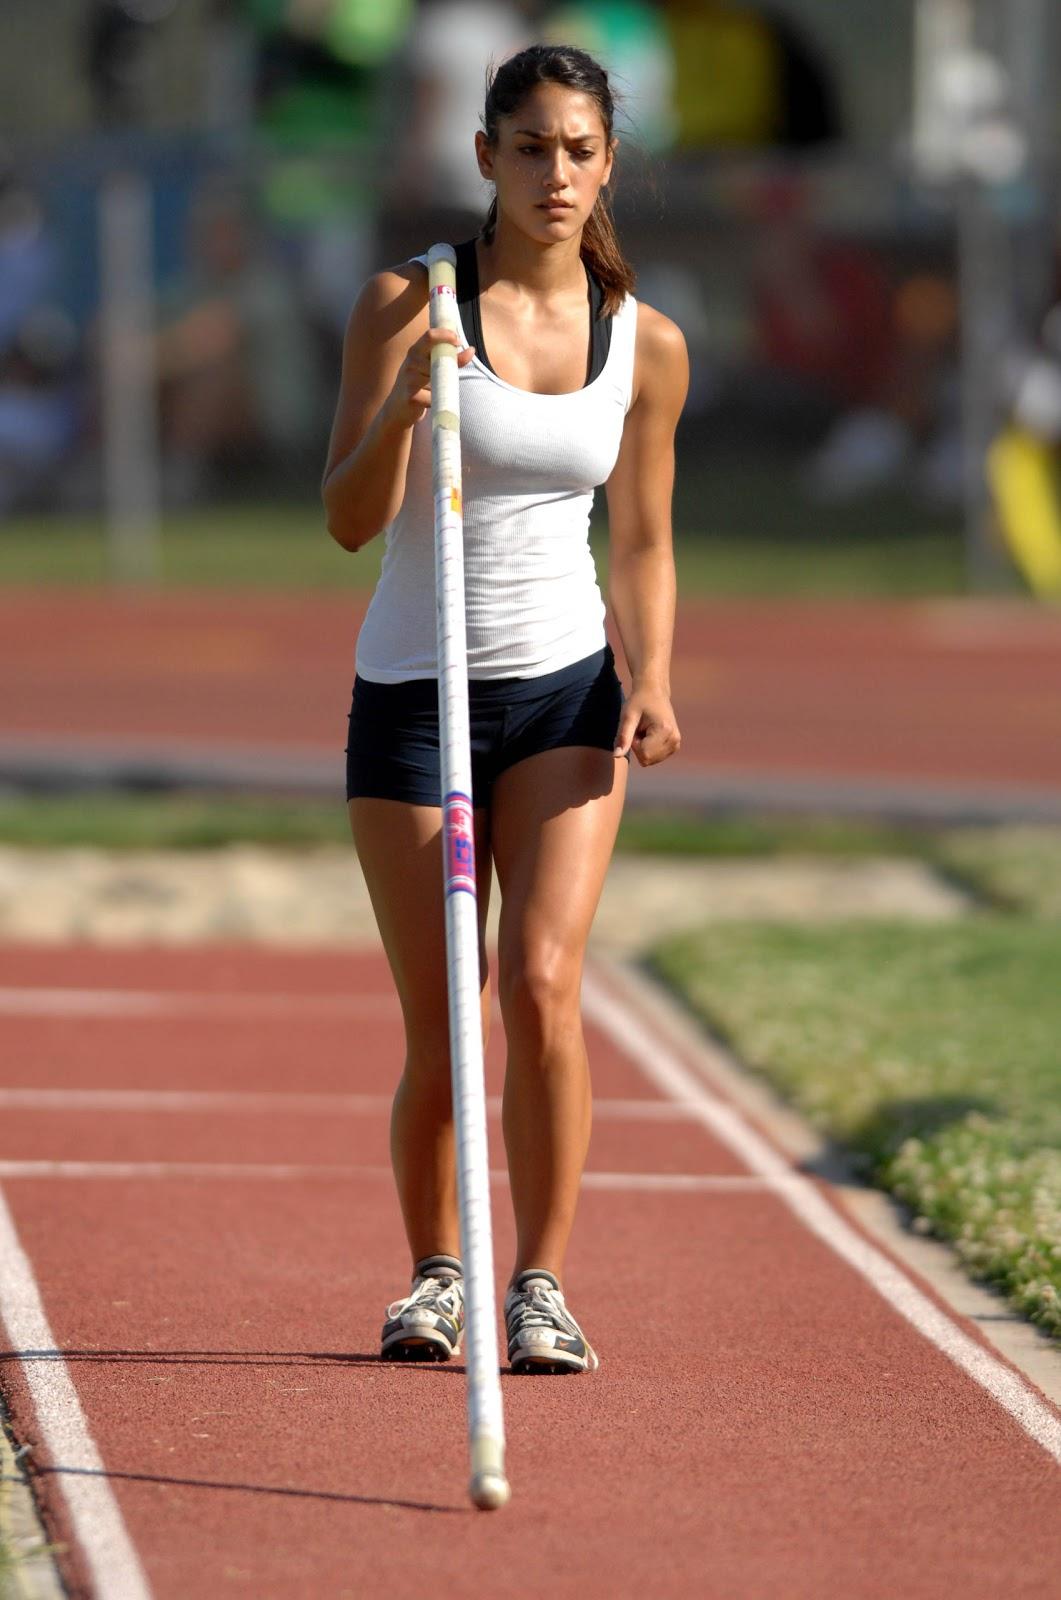 http://4.bp.blogspot.com/-7h1D2swnnLs/UBpKMrGYLfI/AAAAAAAAEIw/pq-XprHOf5c/s1600/Allison_Stokke_Olympics-2012-04.jpg